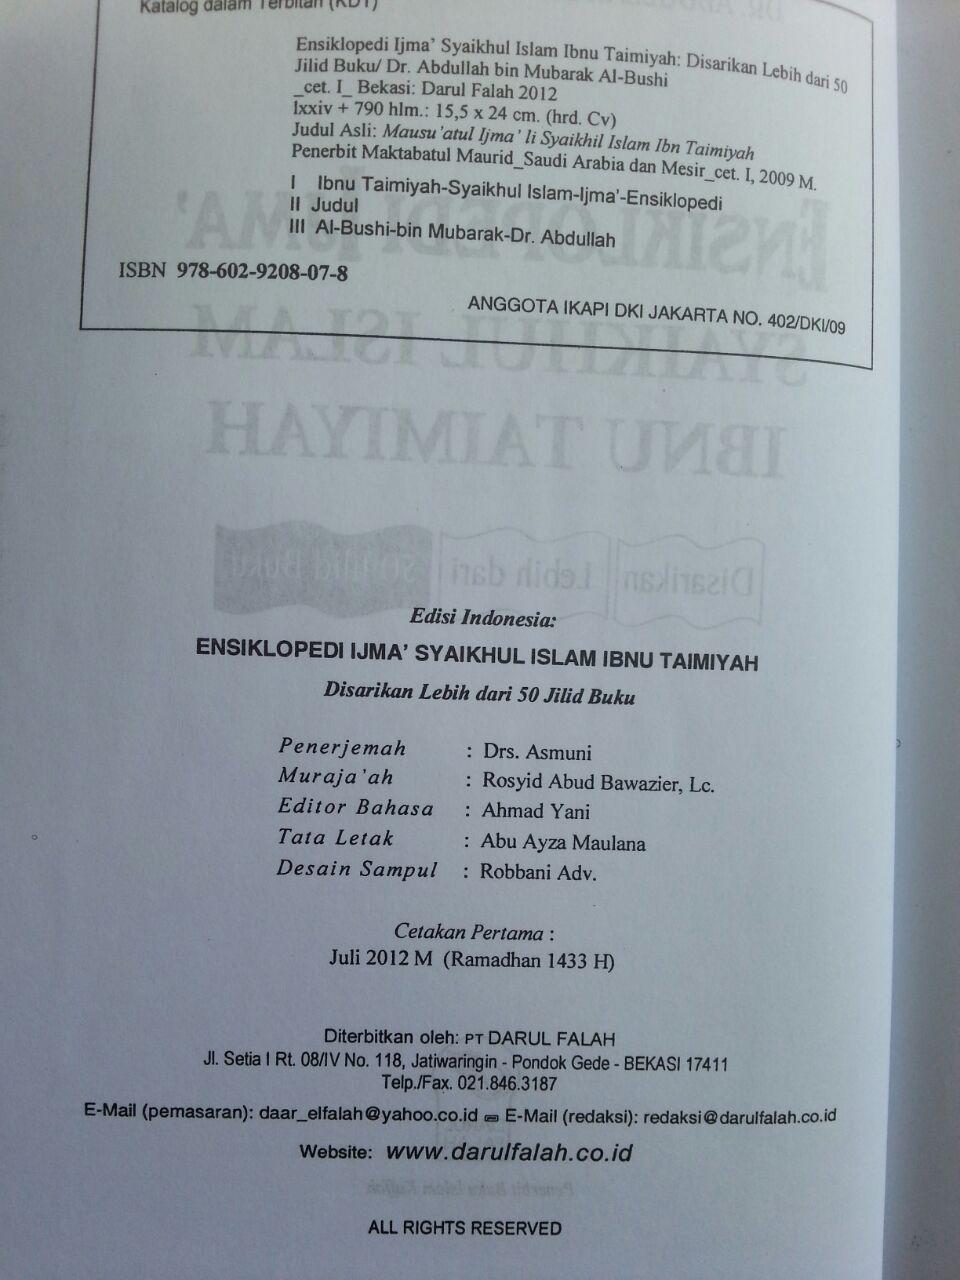 Buku Ensiklopedi Ijma Syaikhul Islam Ibnu Taimiyah isi 2